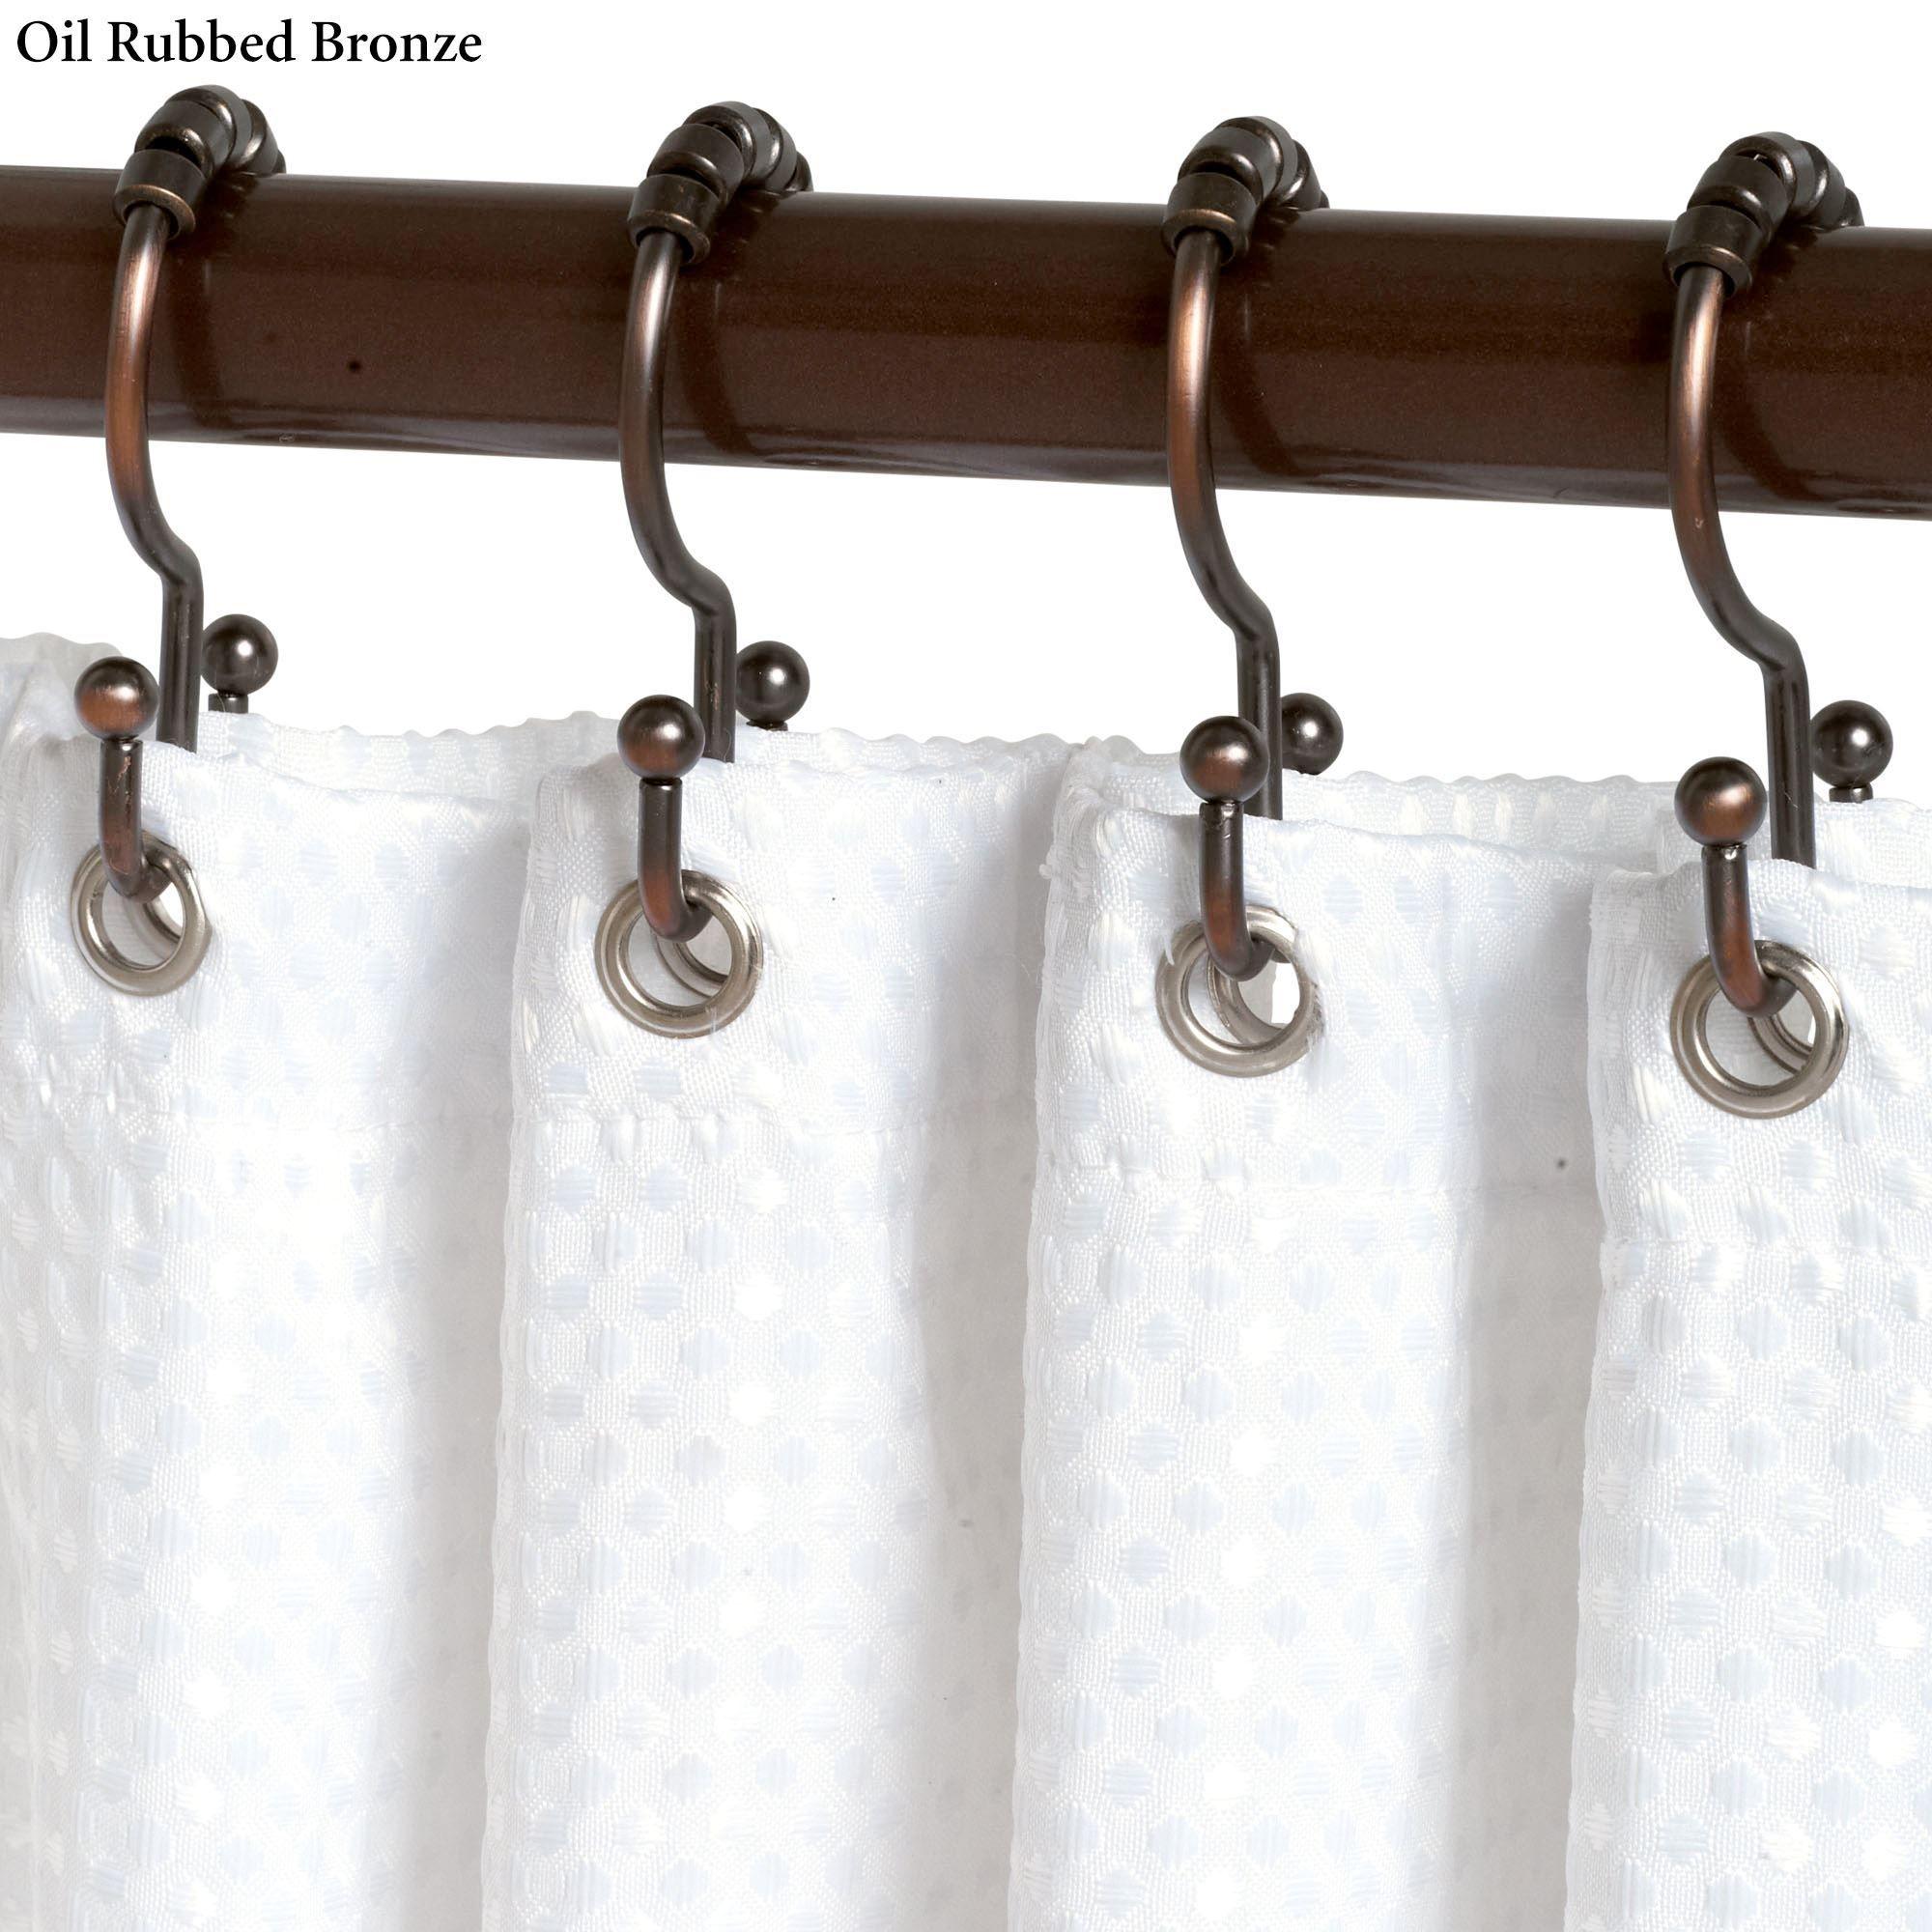 Double Roller Shower Curtain Hook Set